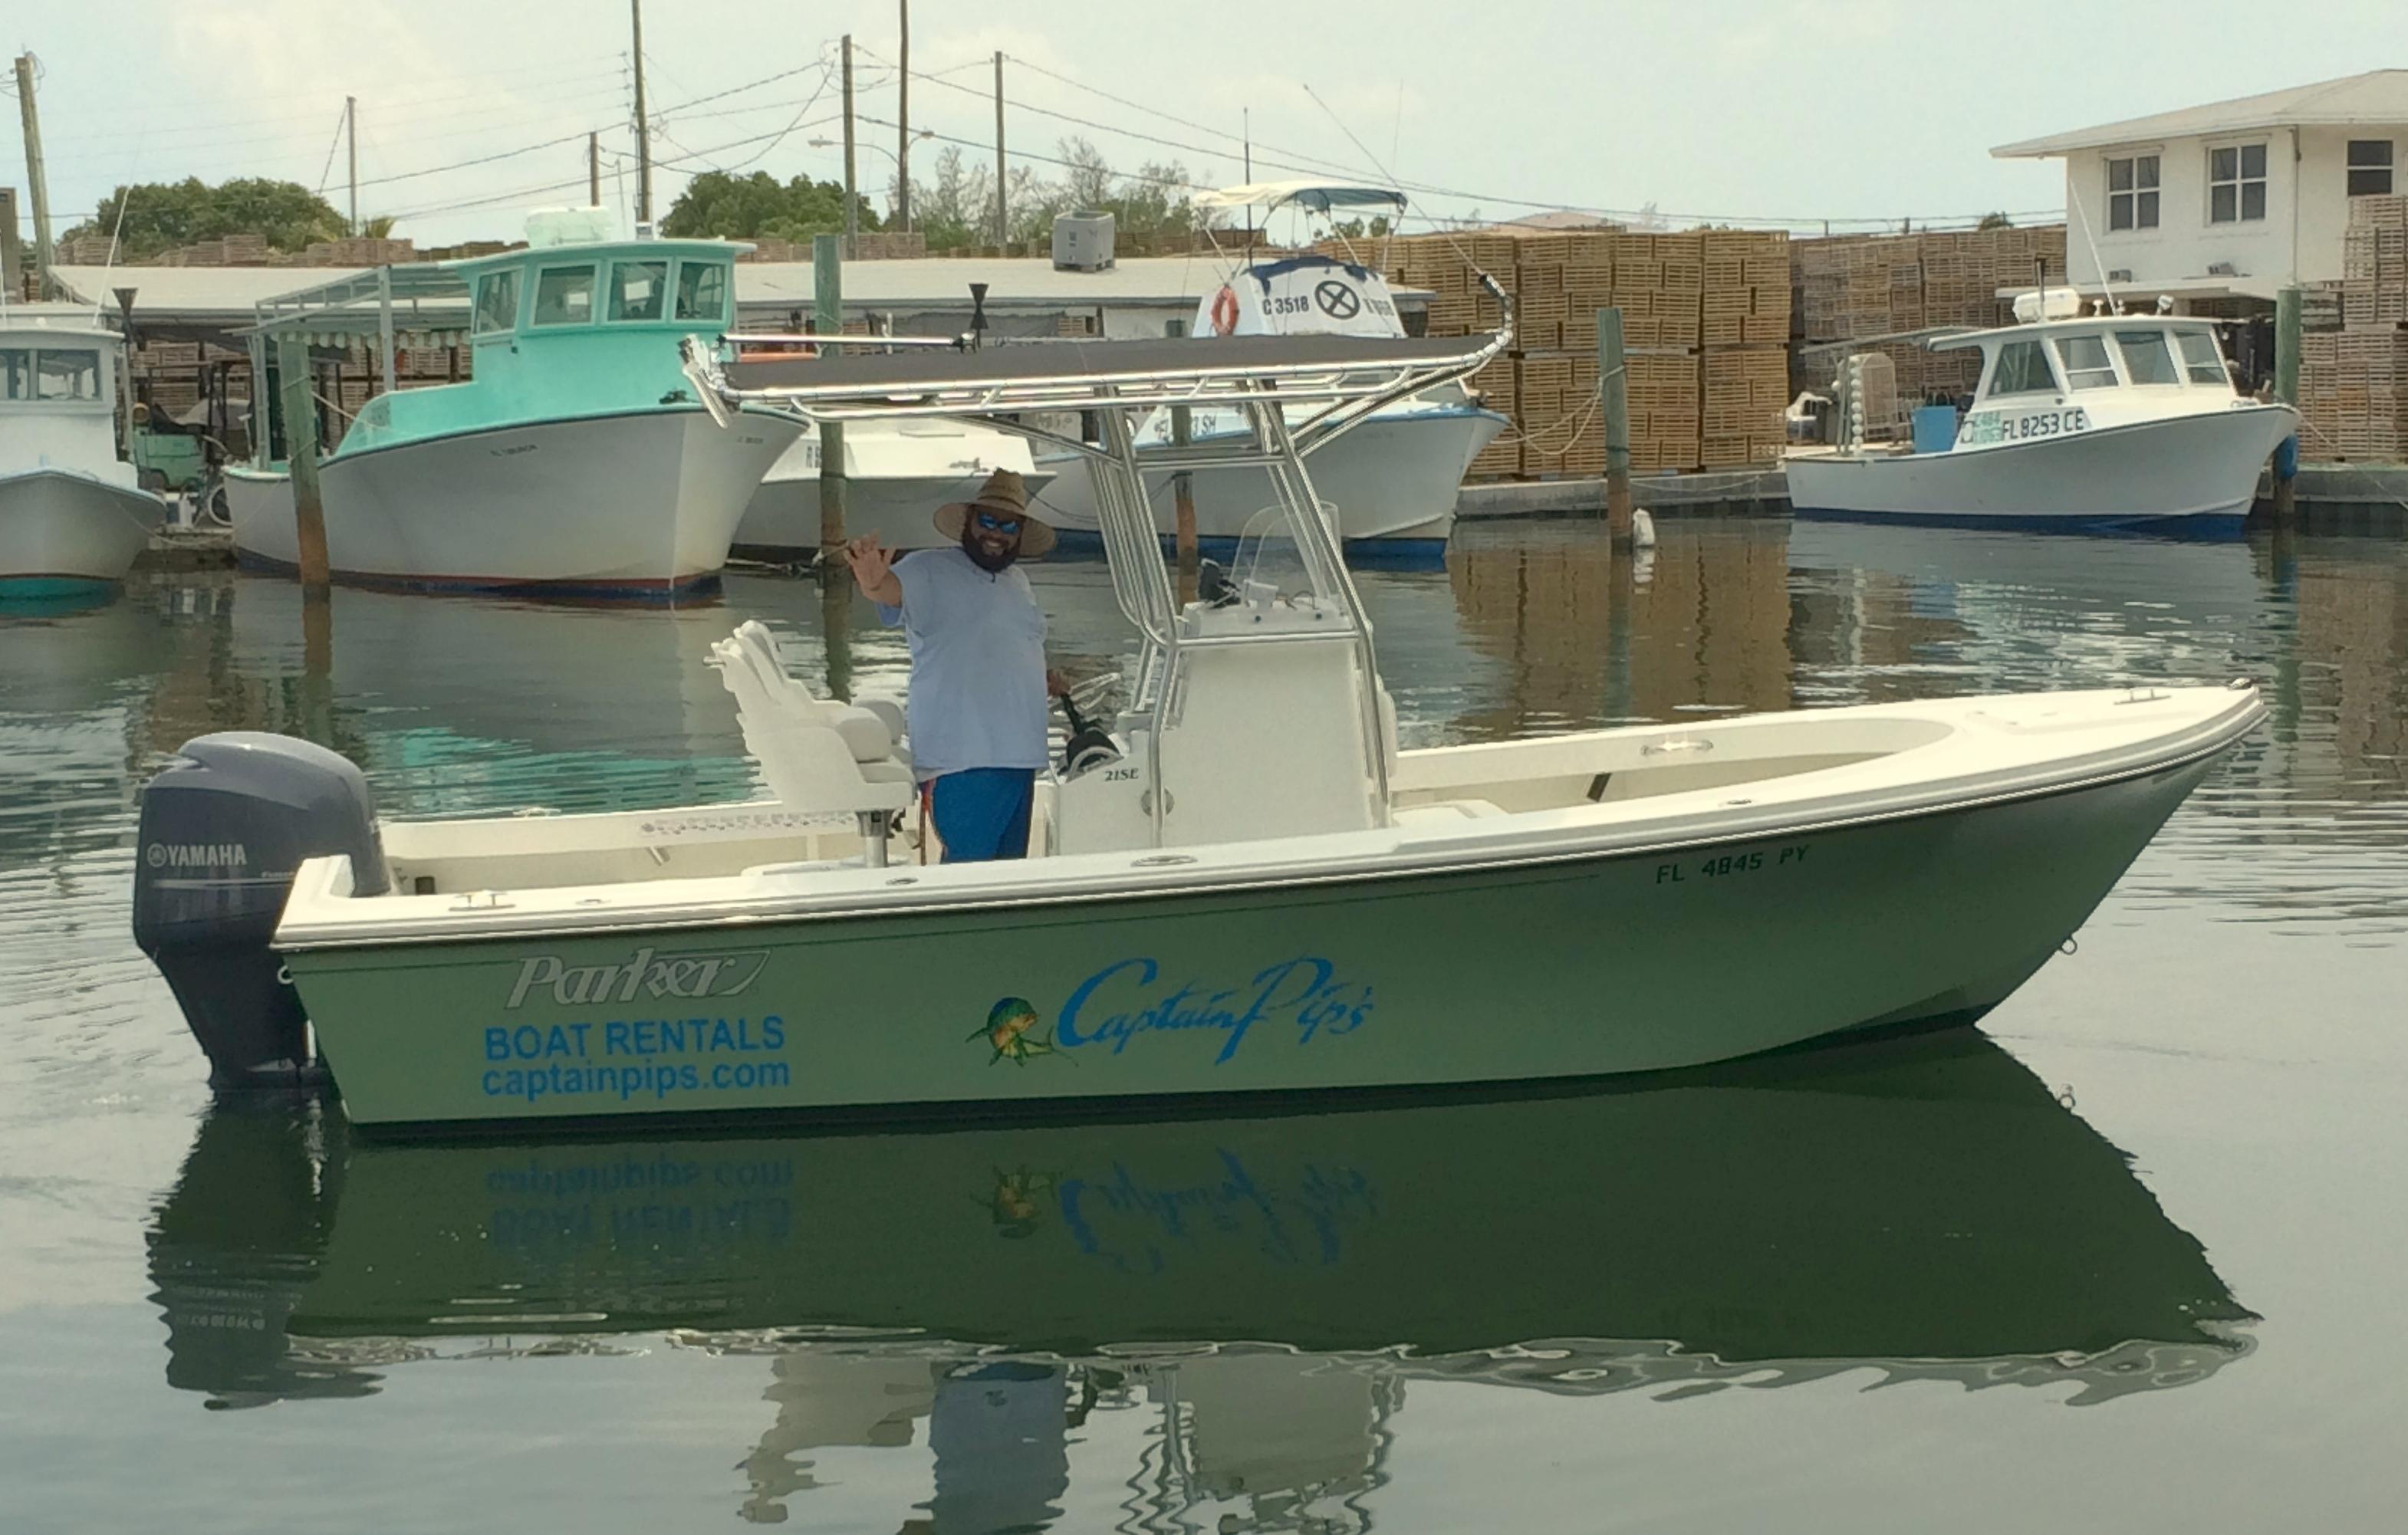 Captain Pip's Marina & Hideaway image 4